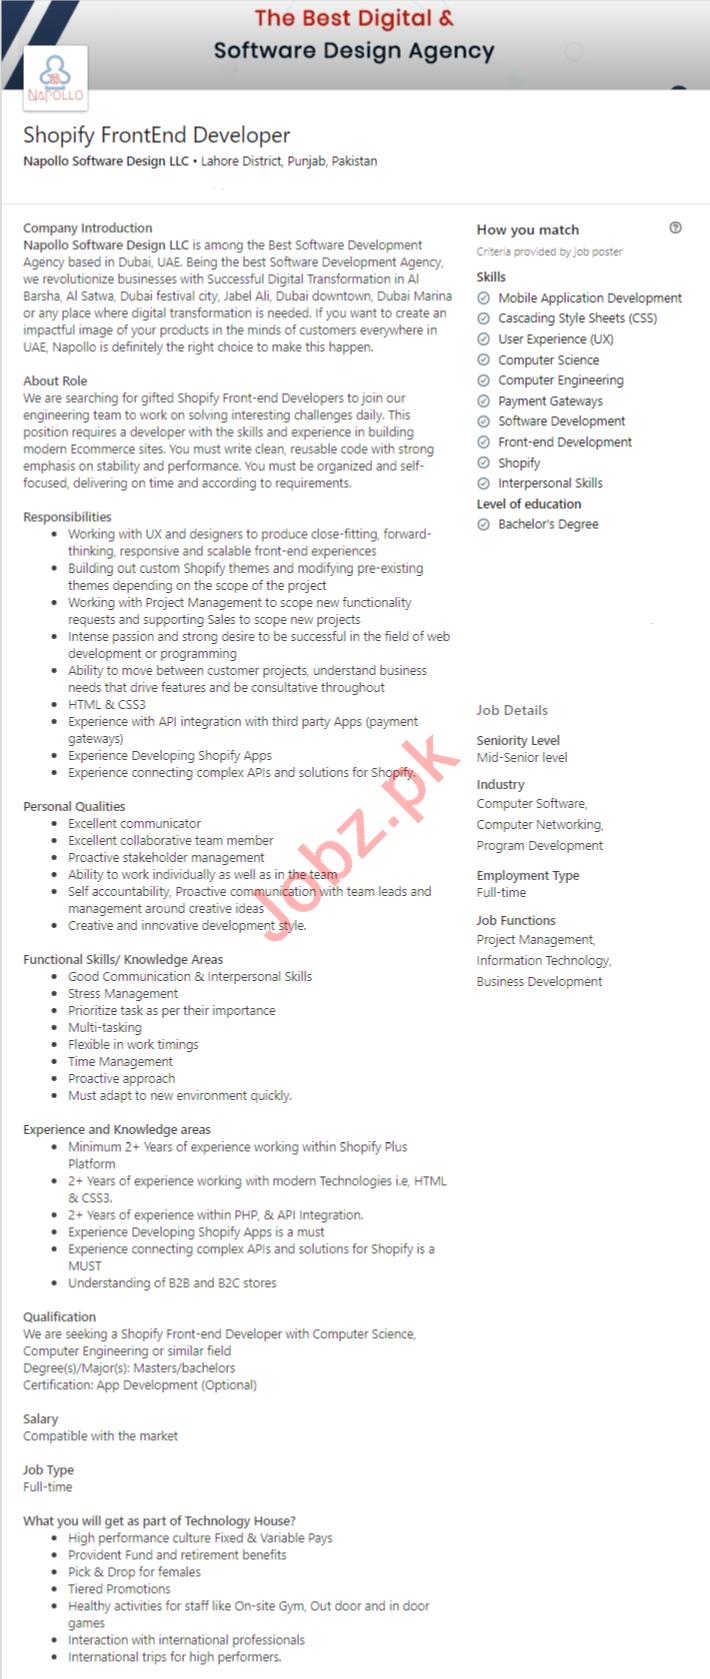 Napollo Software Design LLC Lahore Jobs 2020